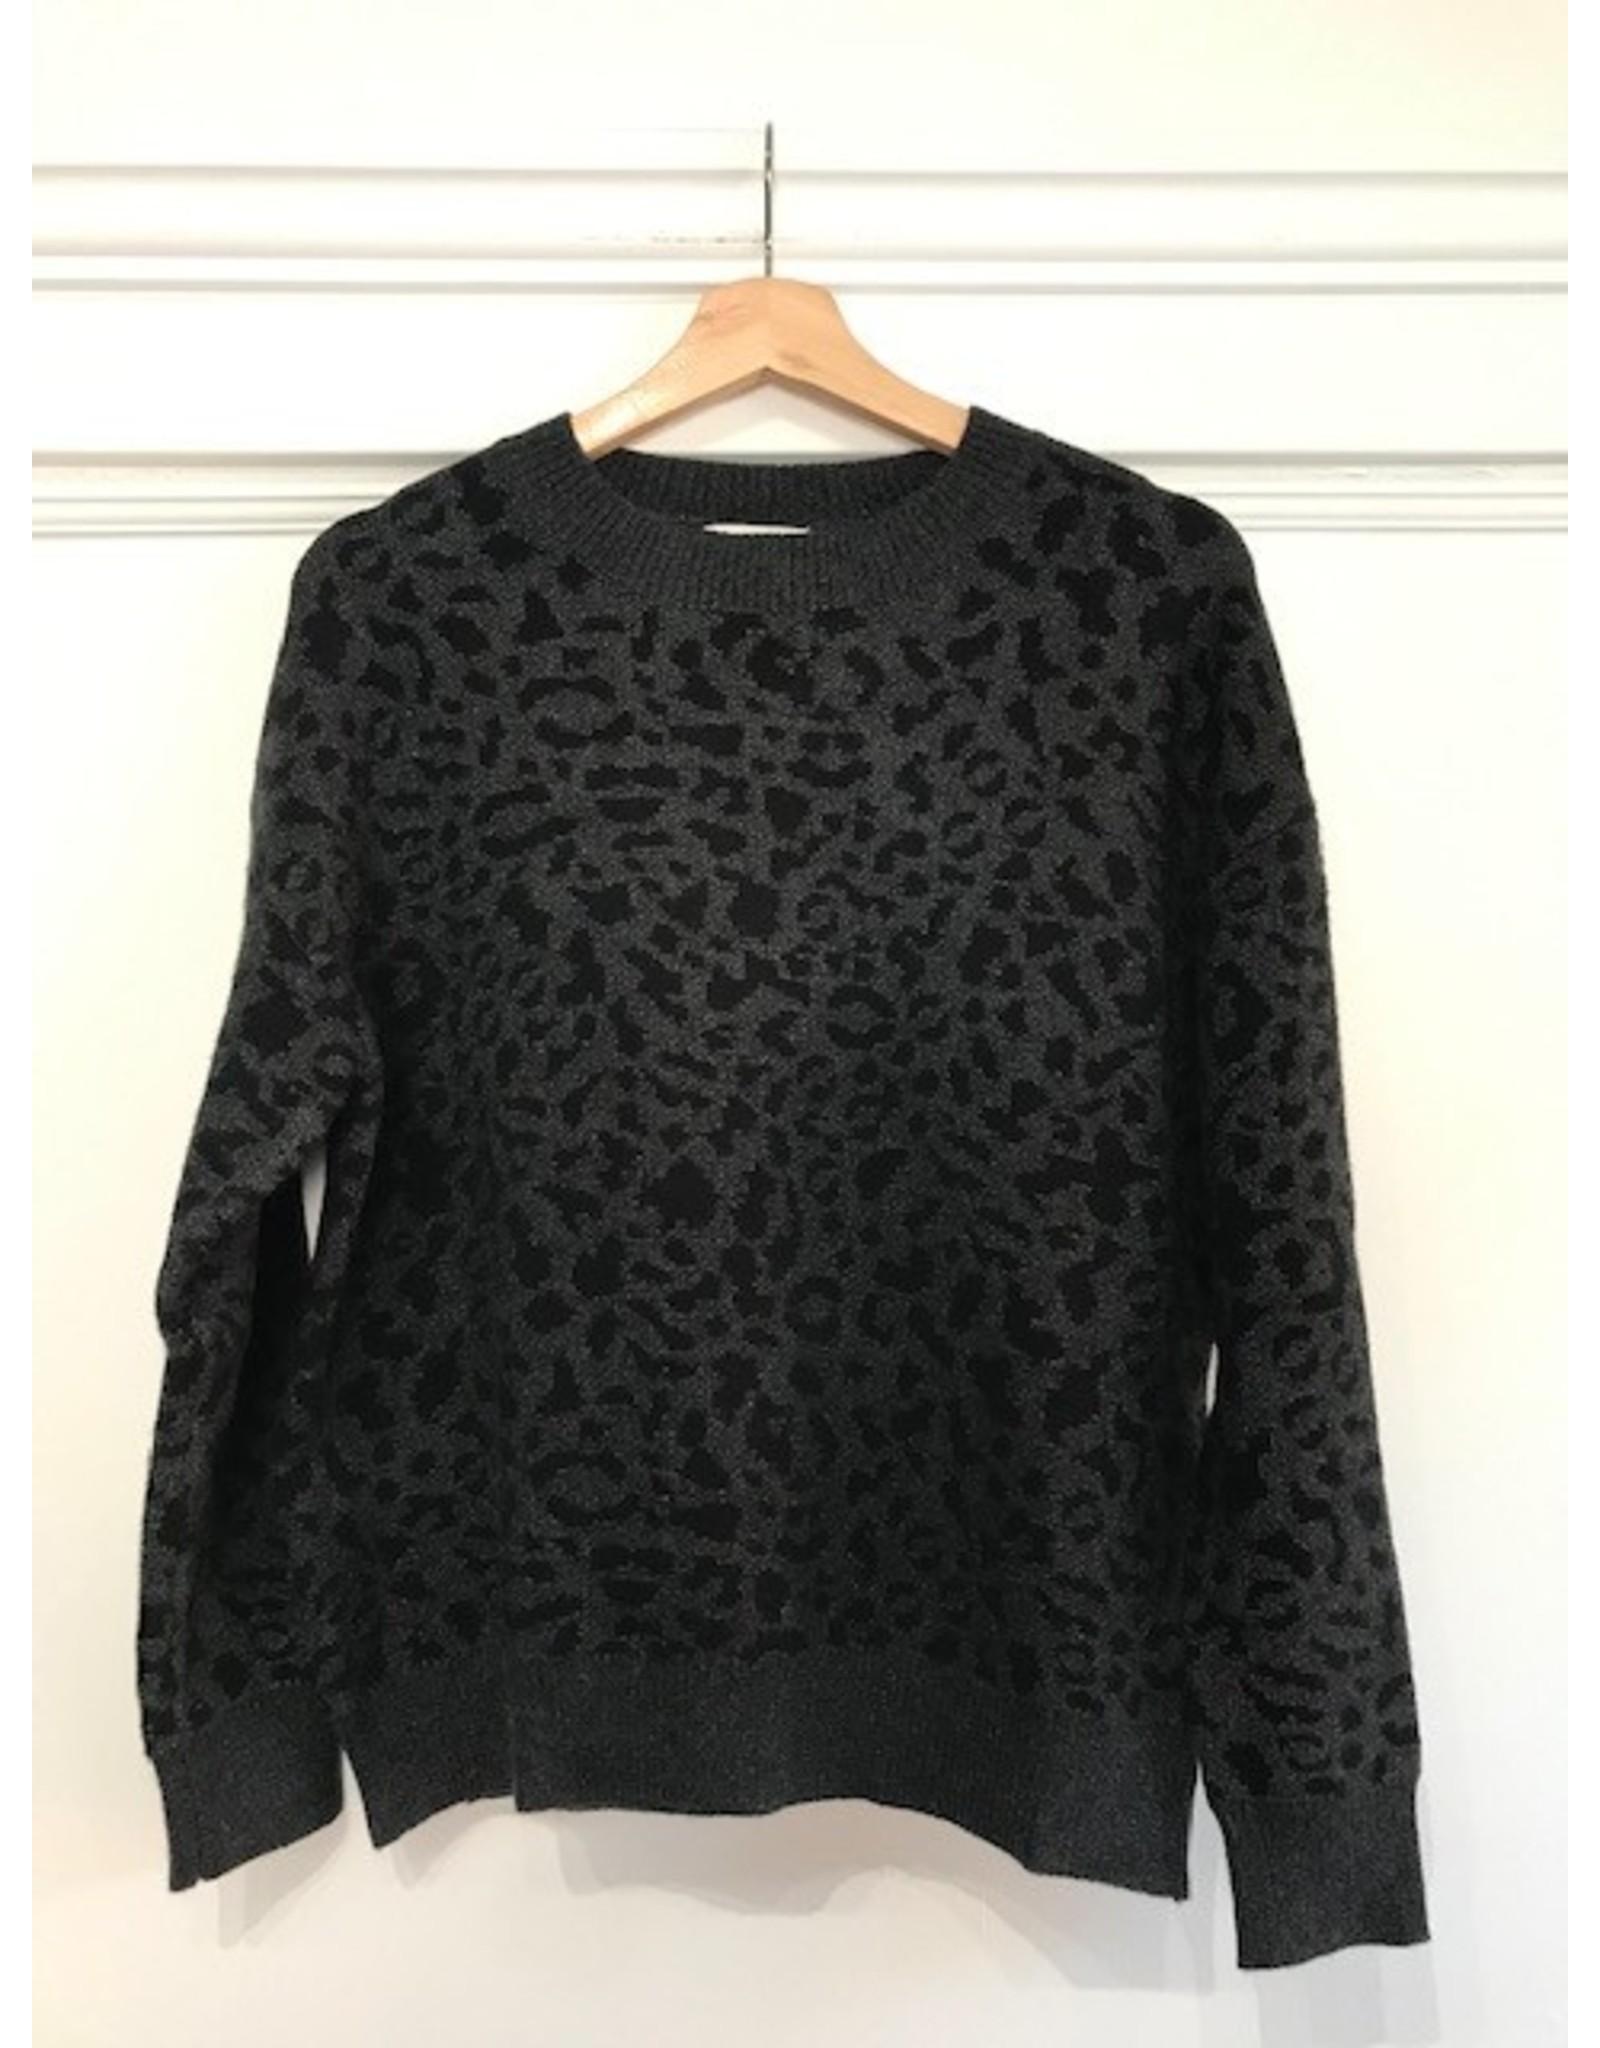 Molly Bracken Molly Bracken - Dark grey and black leopard sweater